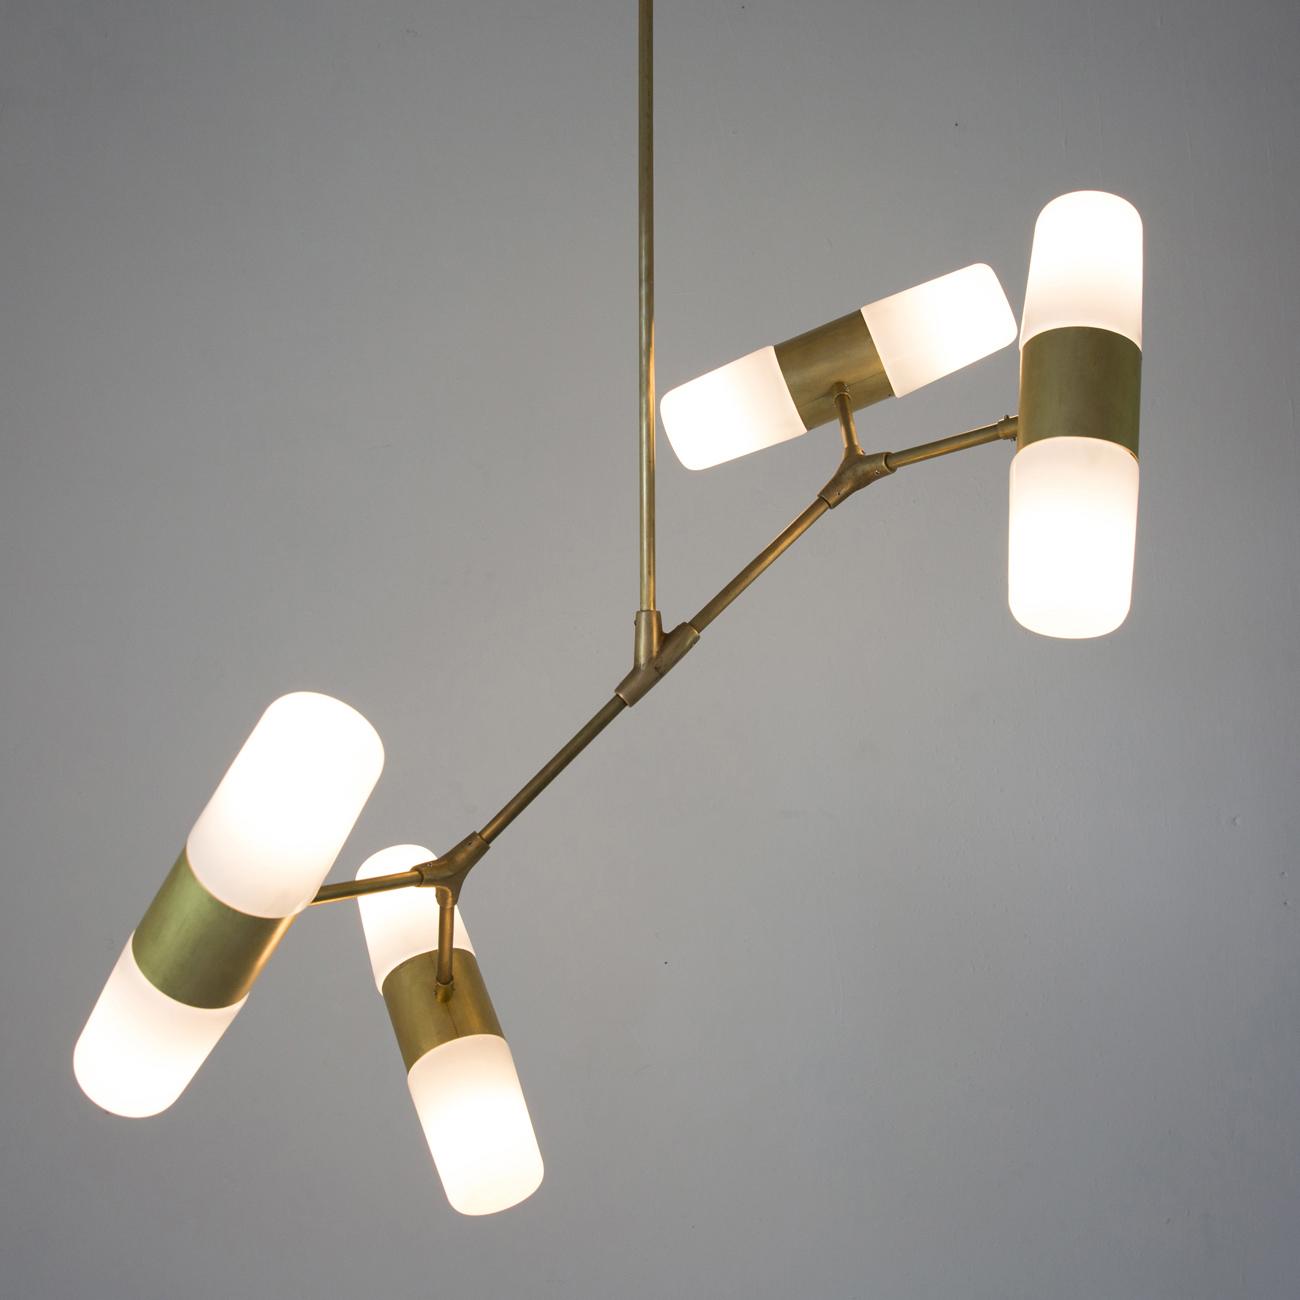 Pendant-Model-01-A-lit-whole2.jpg